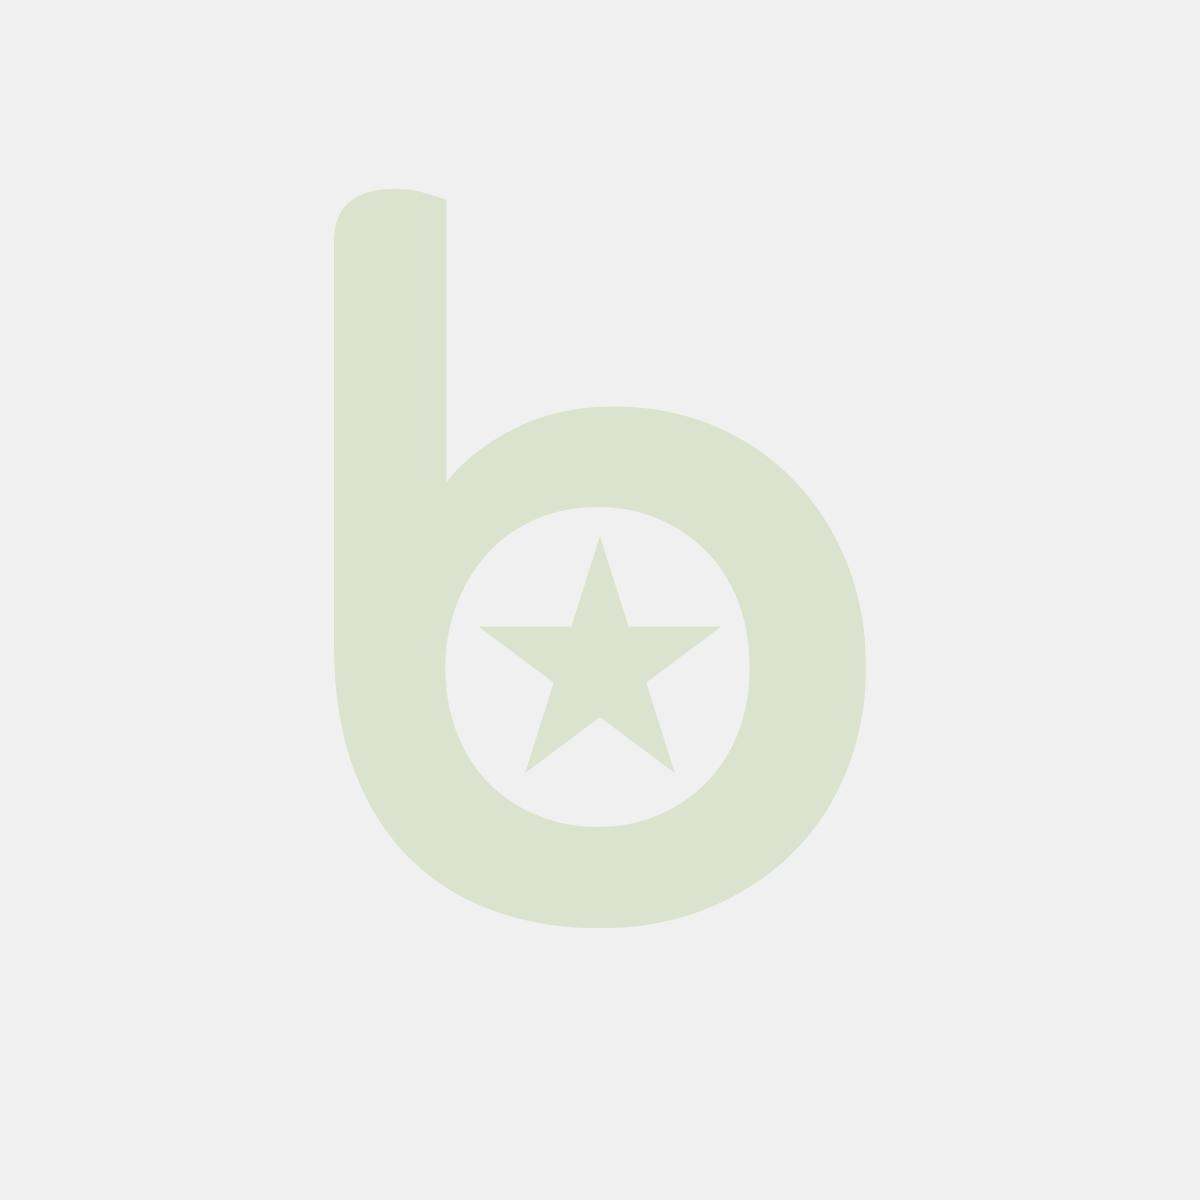 FINGERFOOD - łyżka azjatycka PS dł.12cm krystaliczna op. 30 sztuk